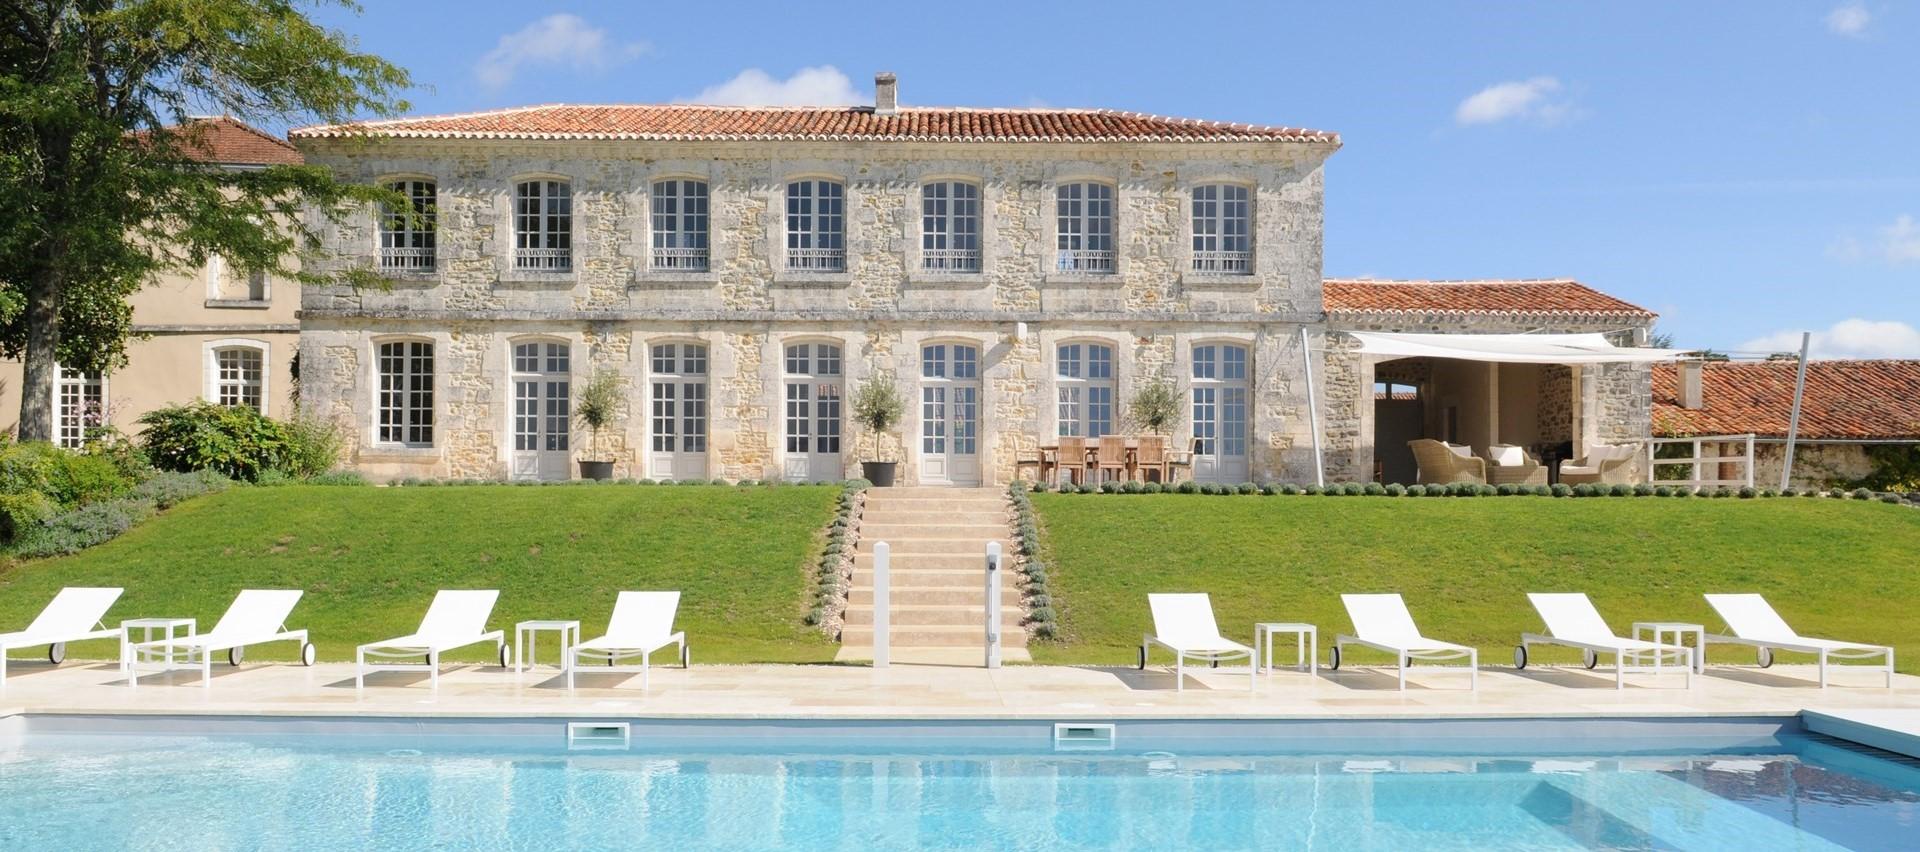 luxury-8-bedroom-villa-dordogne